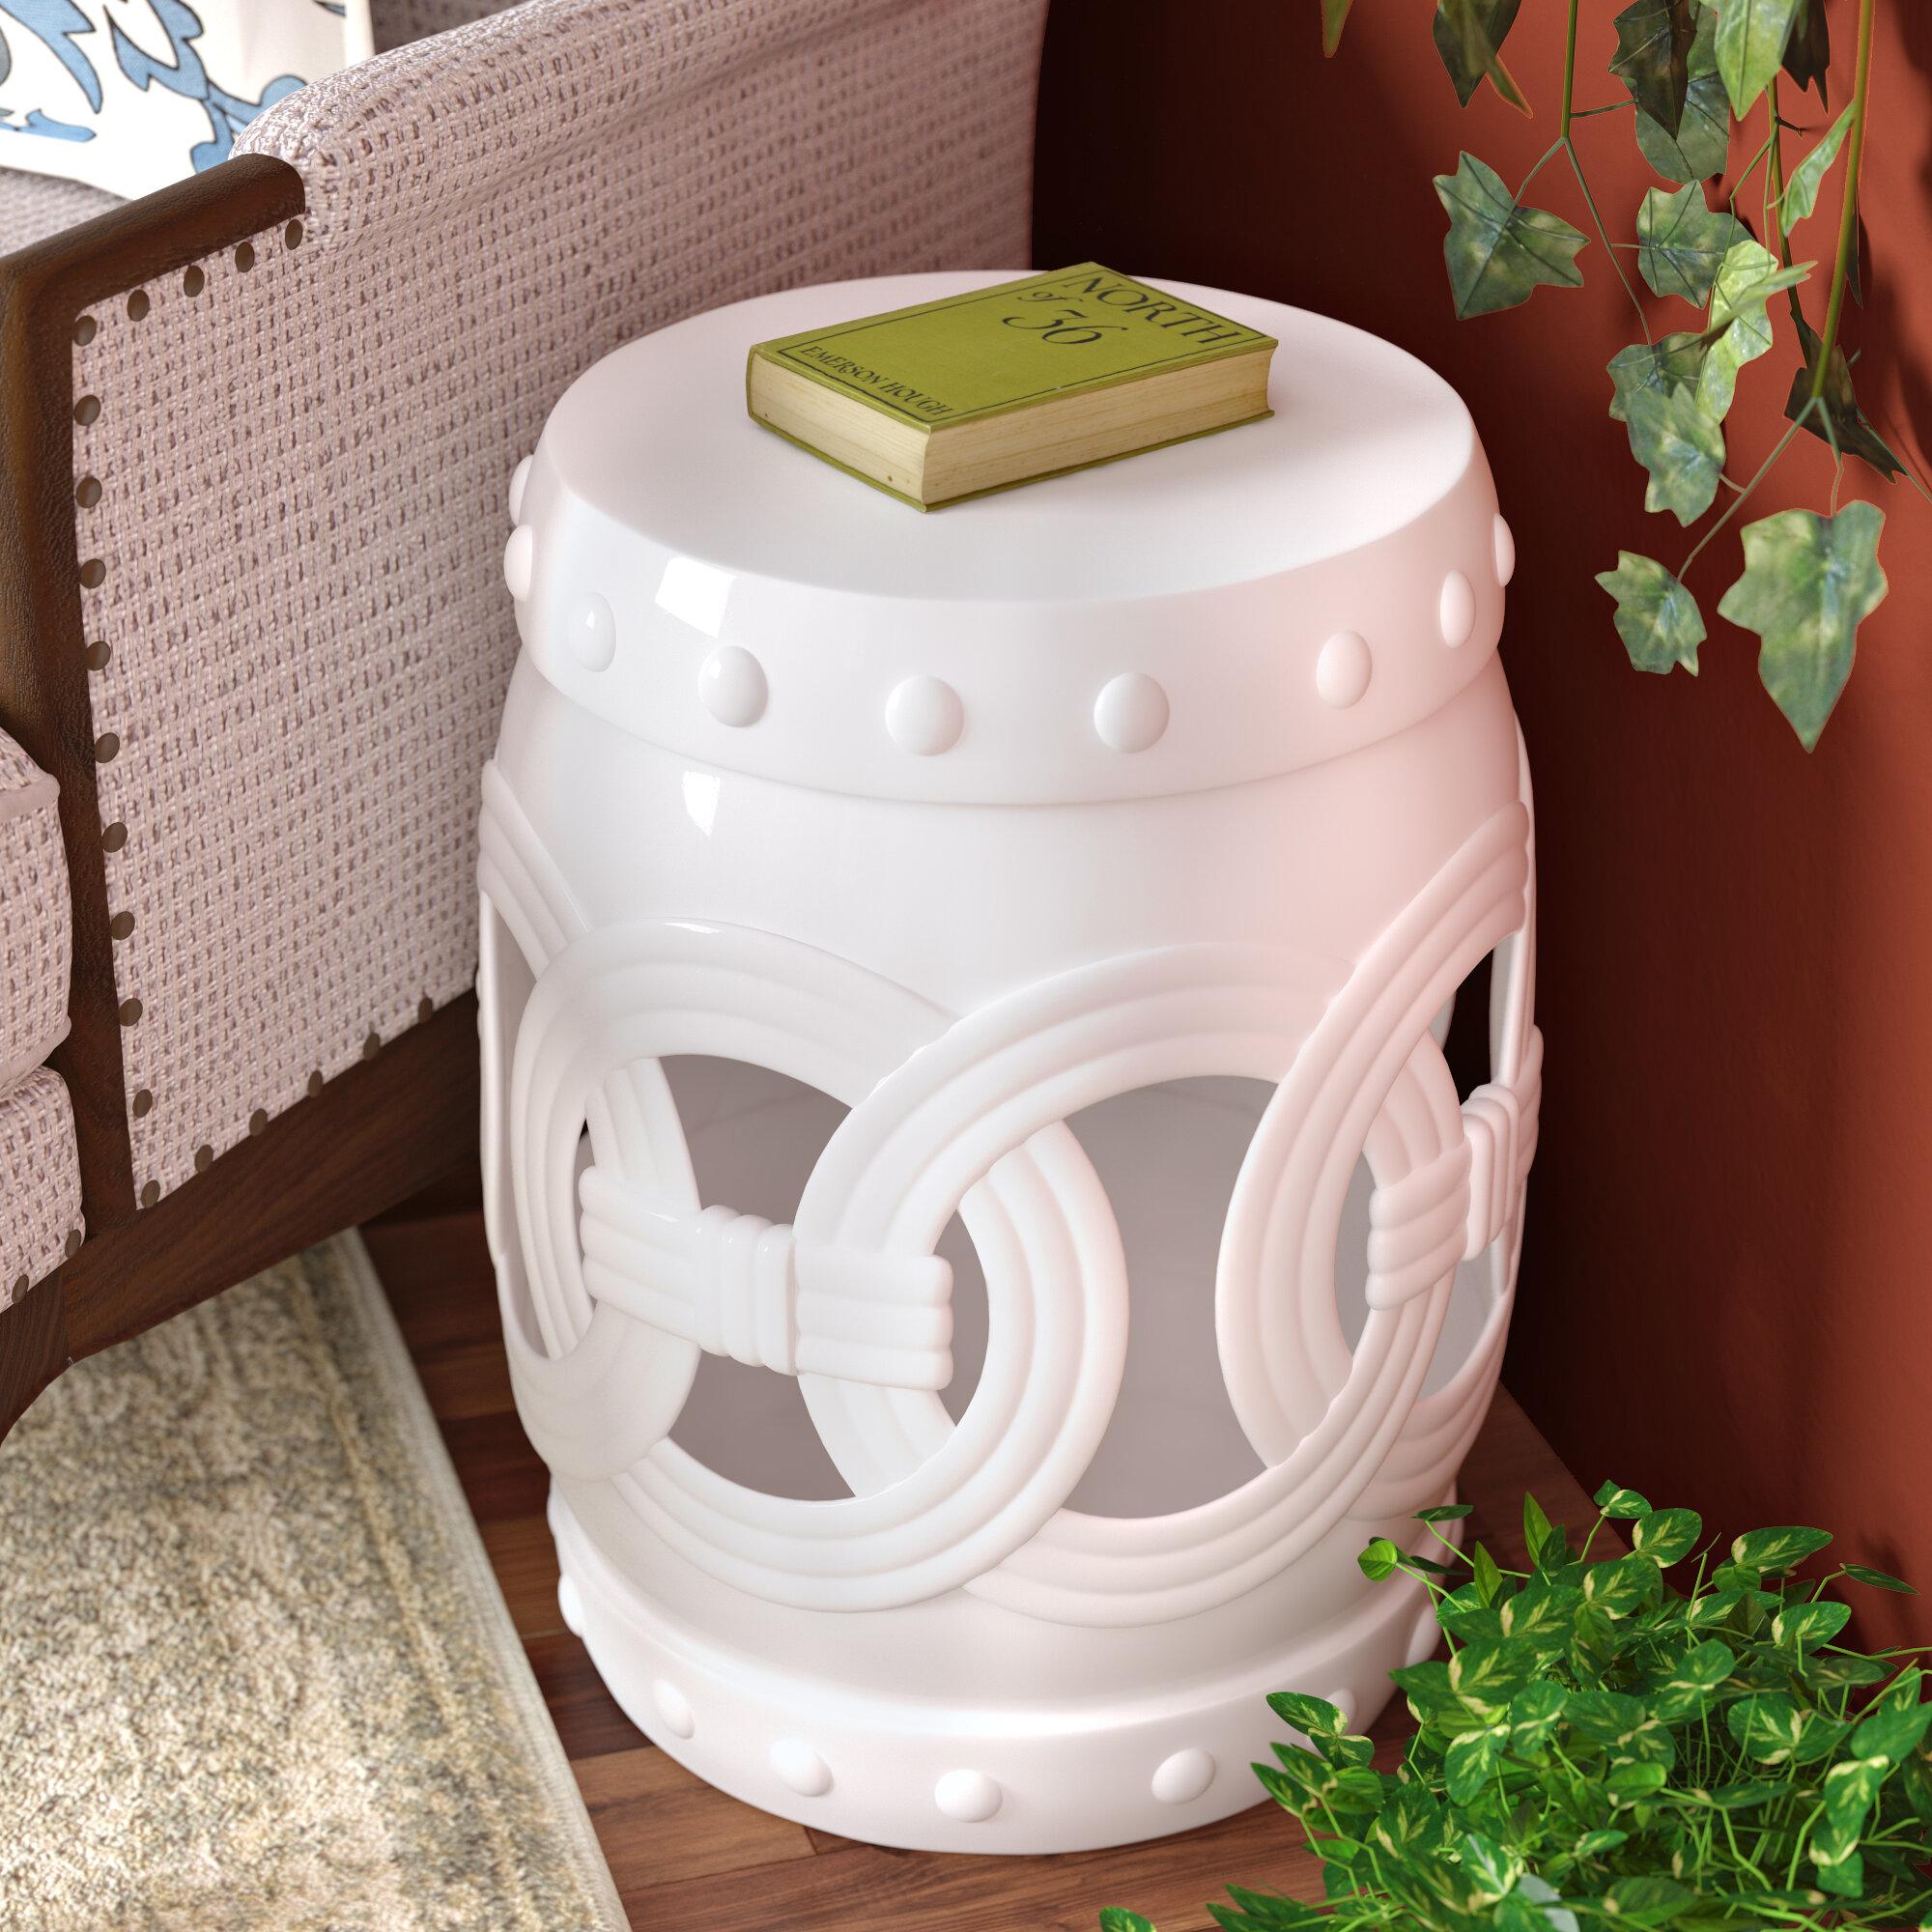 Kilpatrick Feng Shui Ceramic Garden Stool With Kujawa Ceramic Garden Stools (View 10 of 25)